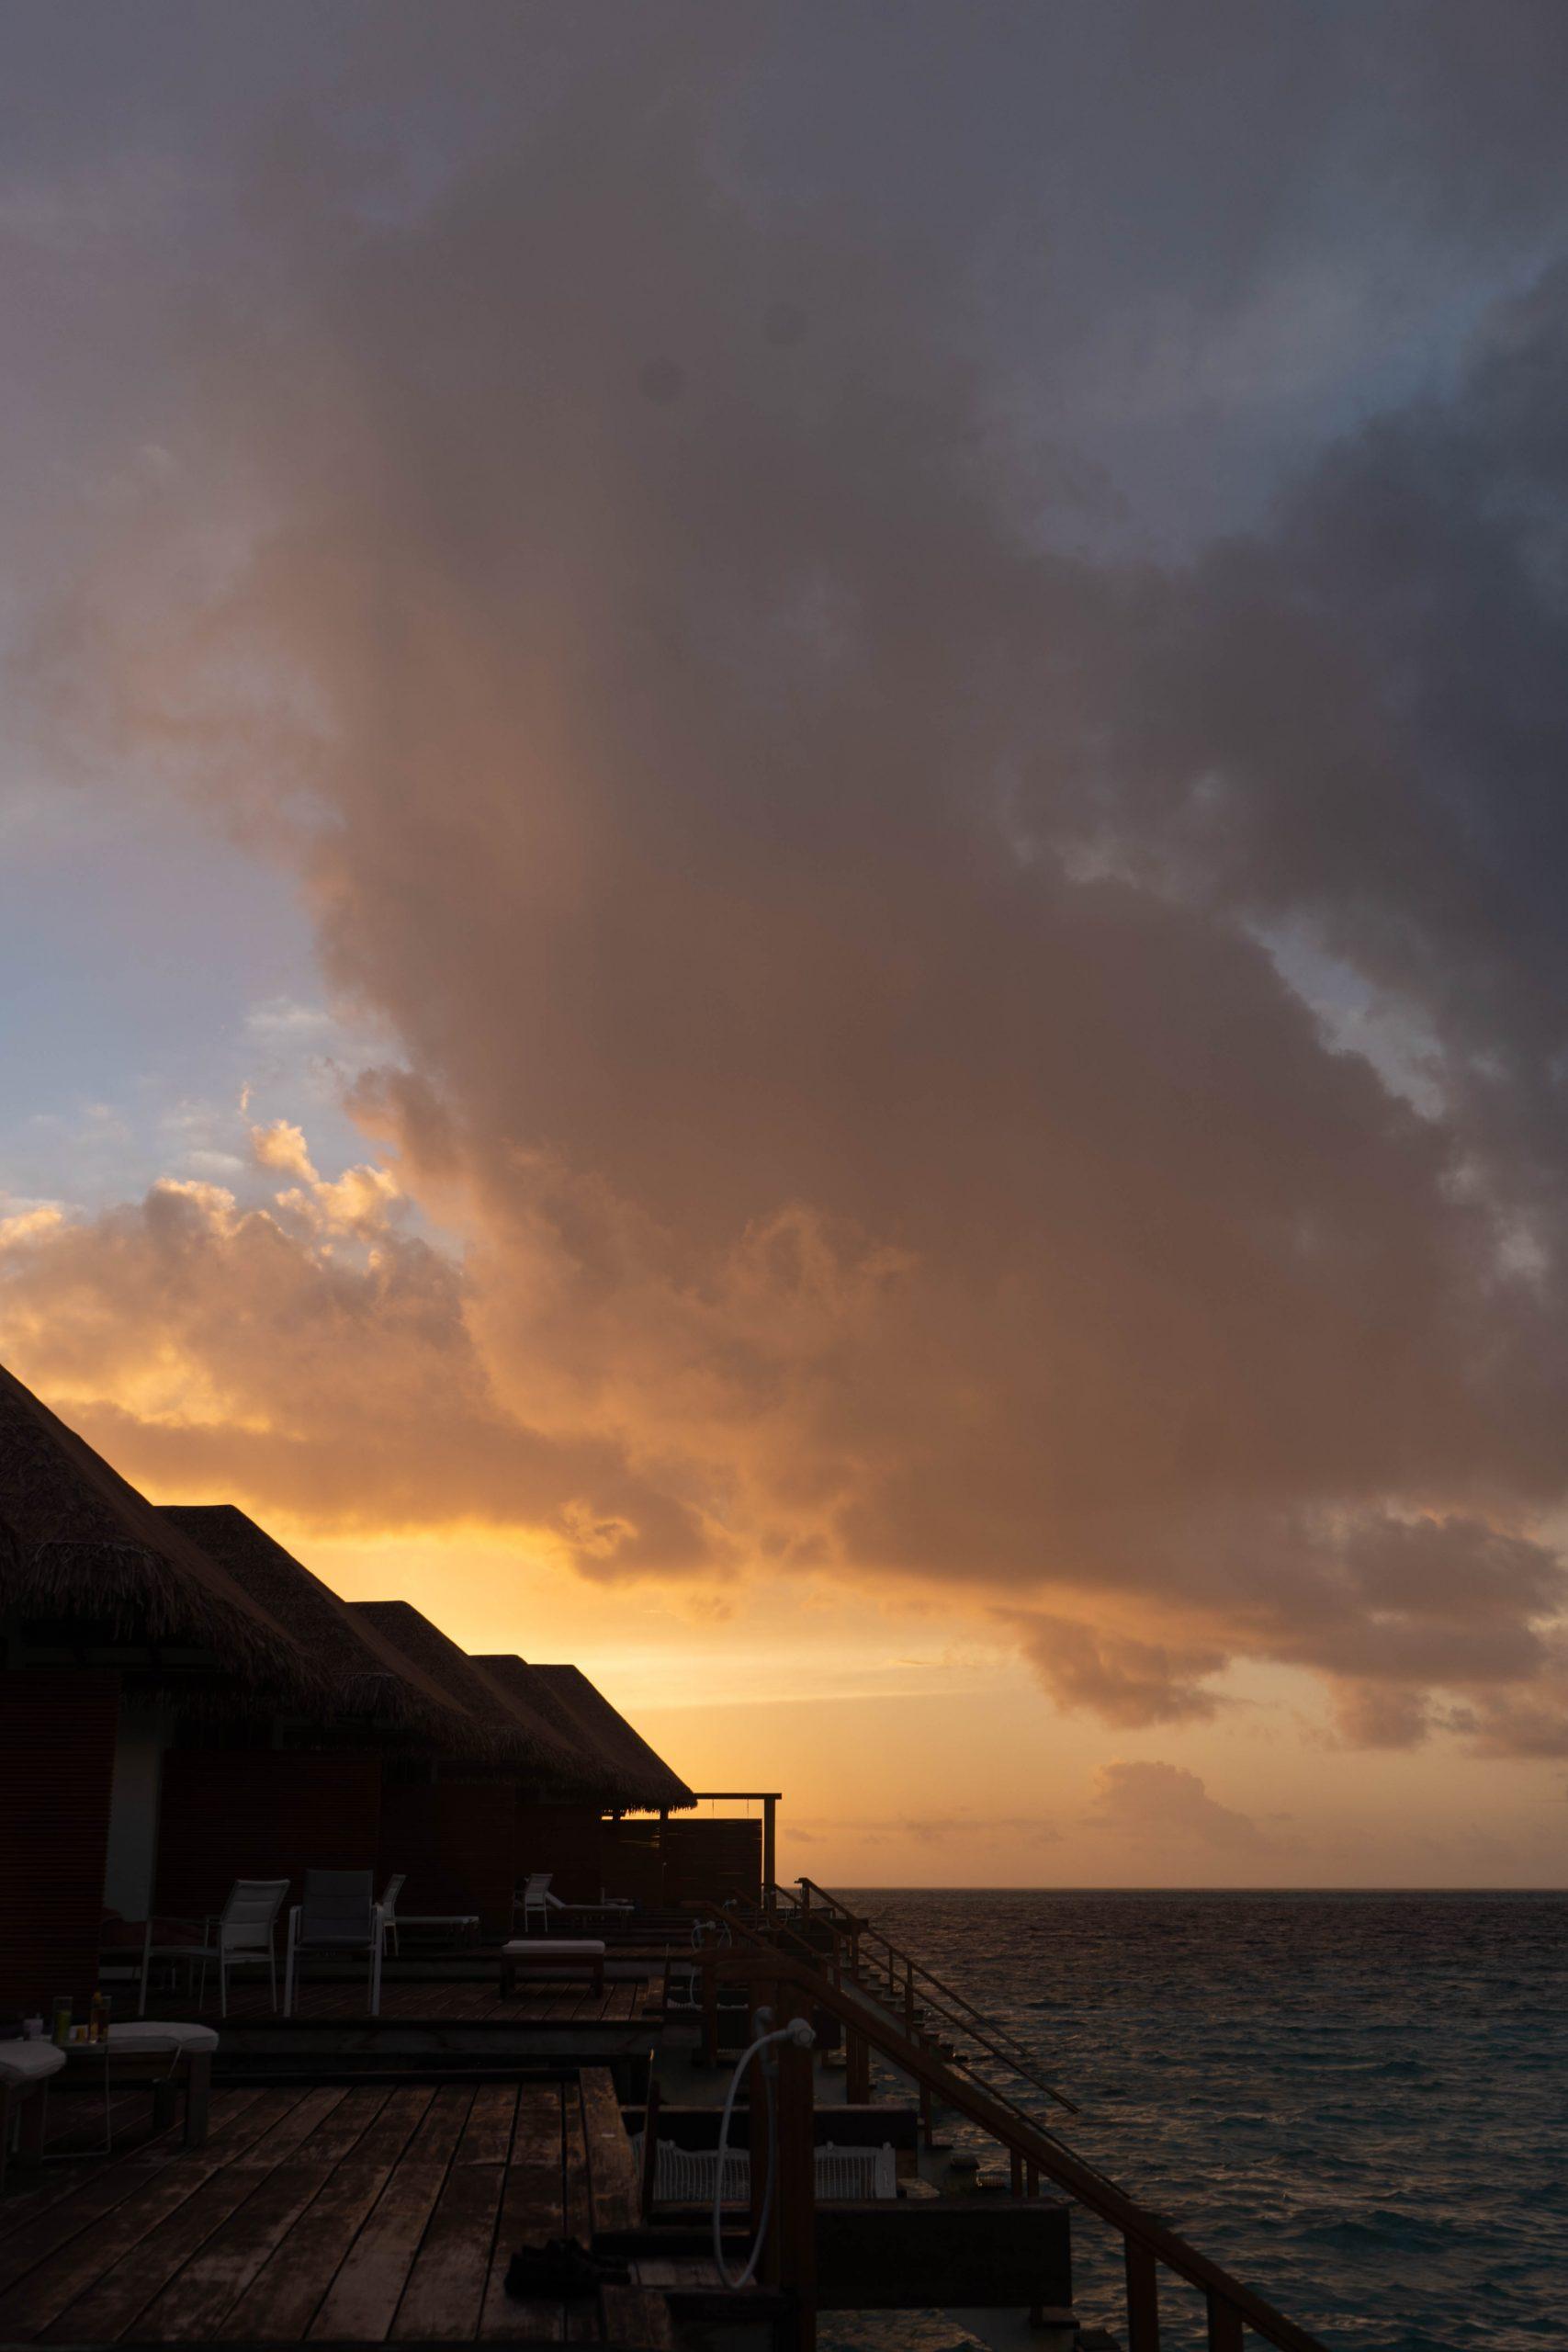 sunset overwater villa cinnamon velifushi maldives south asia indian ocean big cloud orange sky